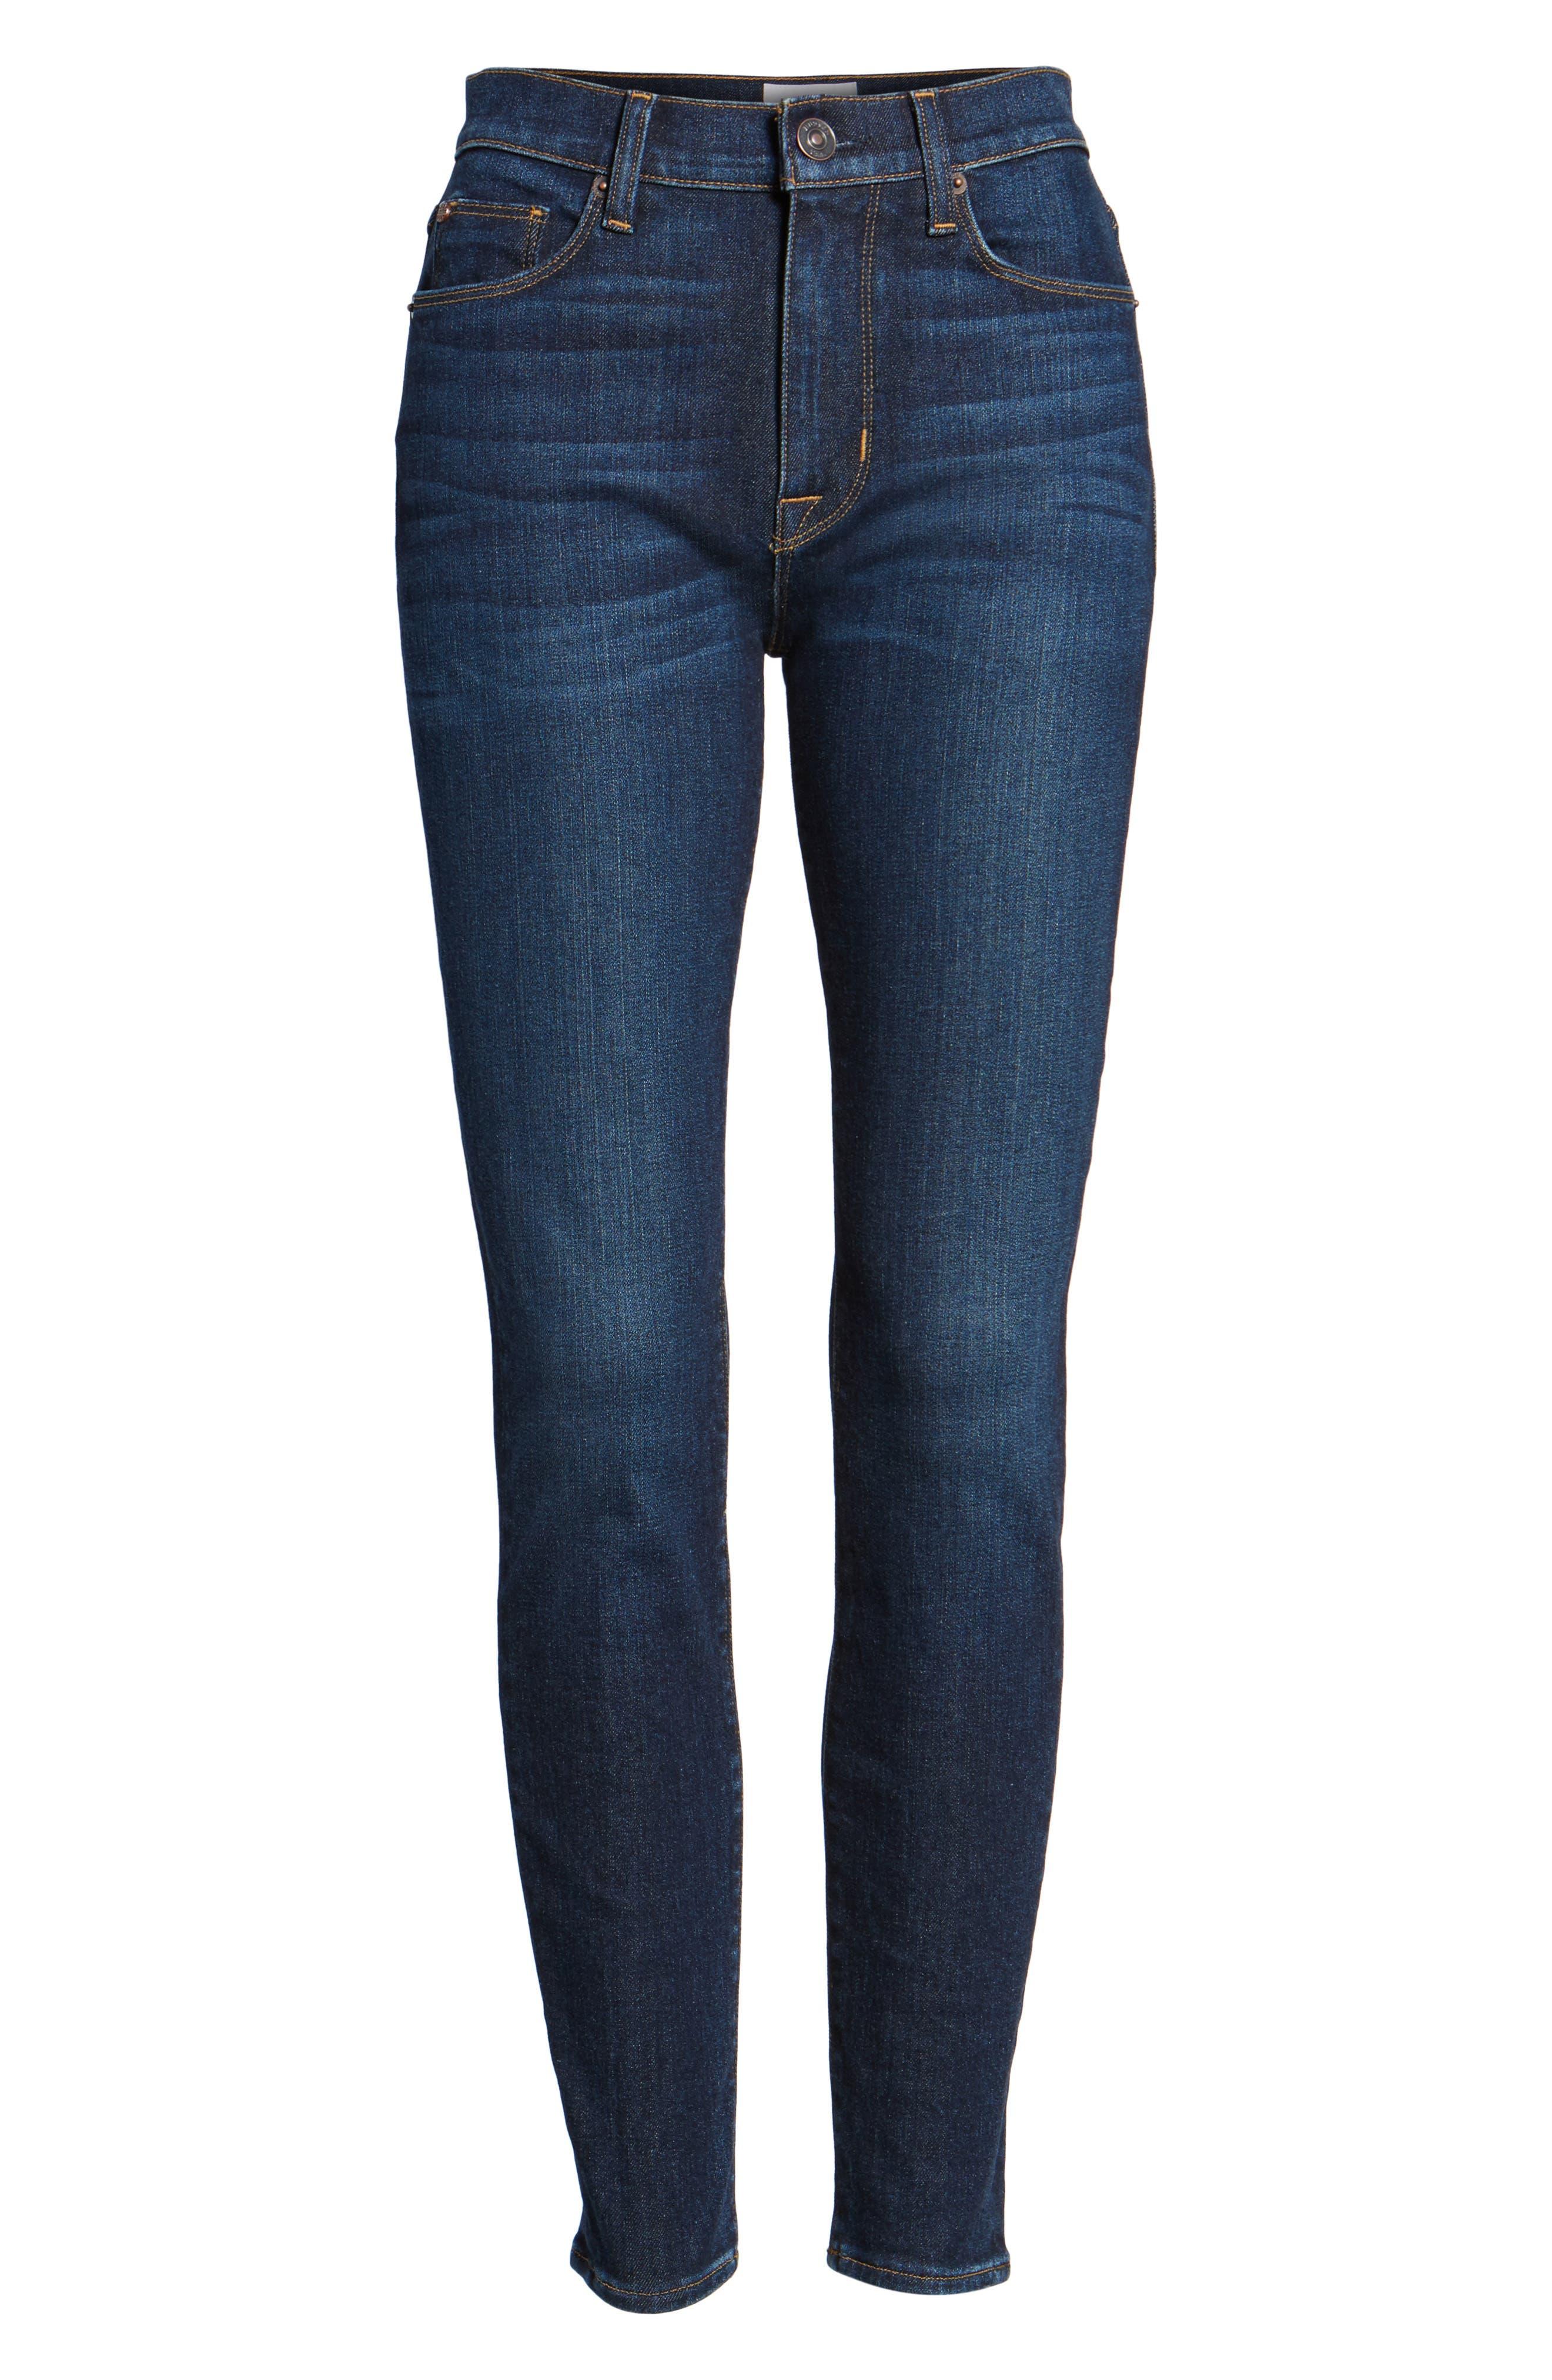 Barbara High Waist Ankle Super Skinny Jeans,                             Alternate thumbnail 6, color,                             Daze